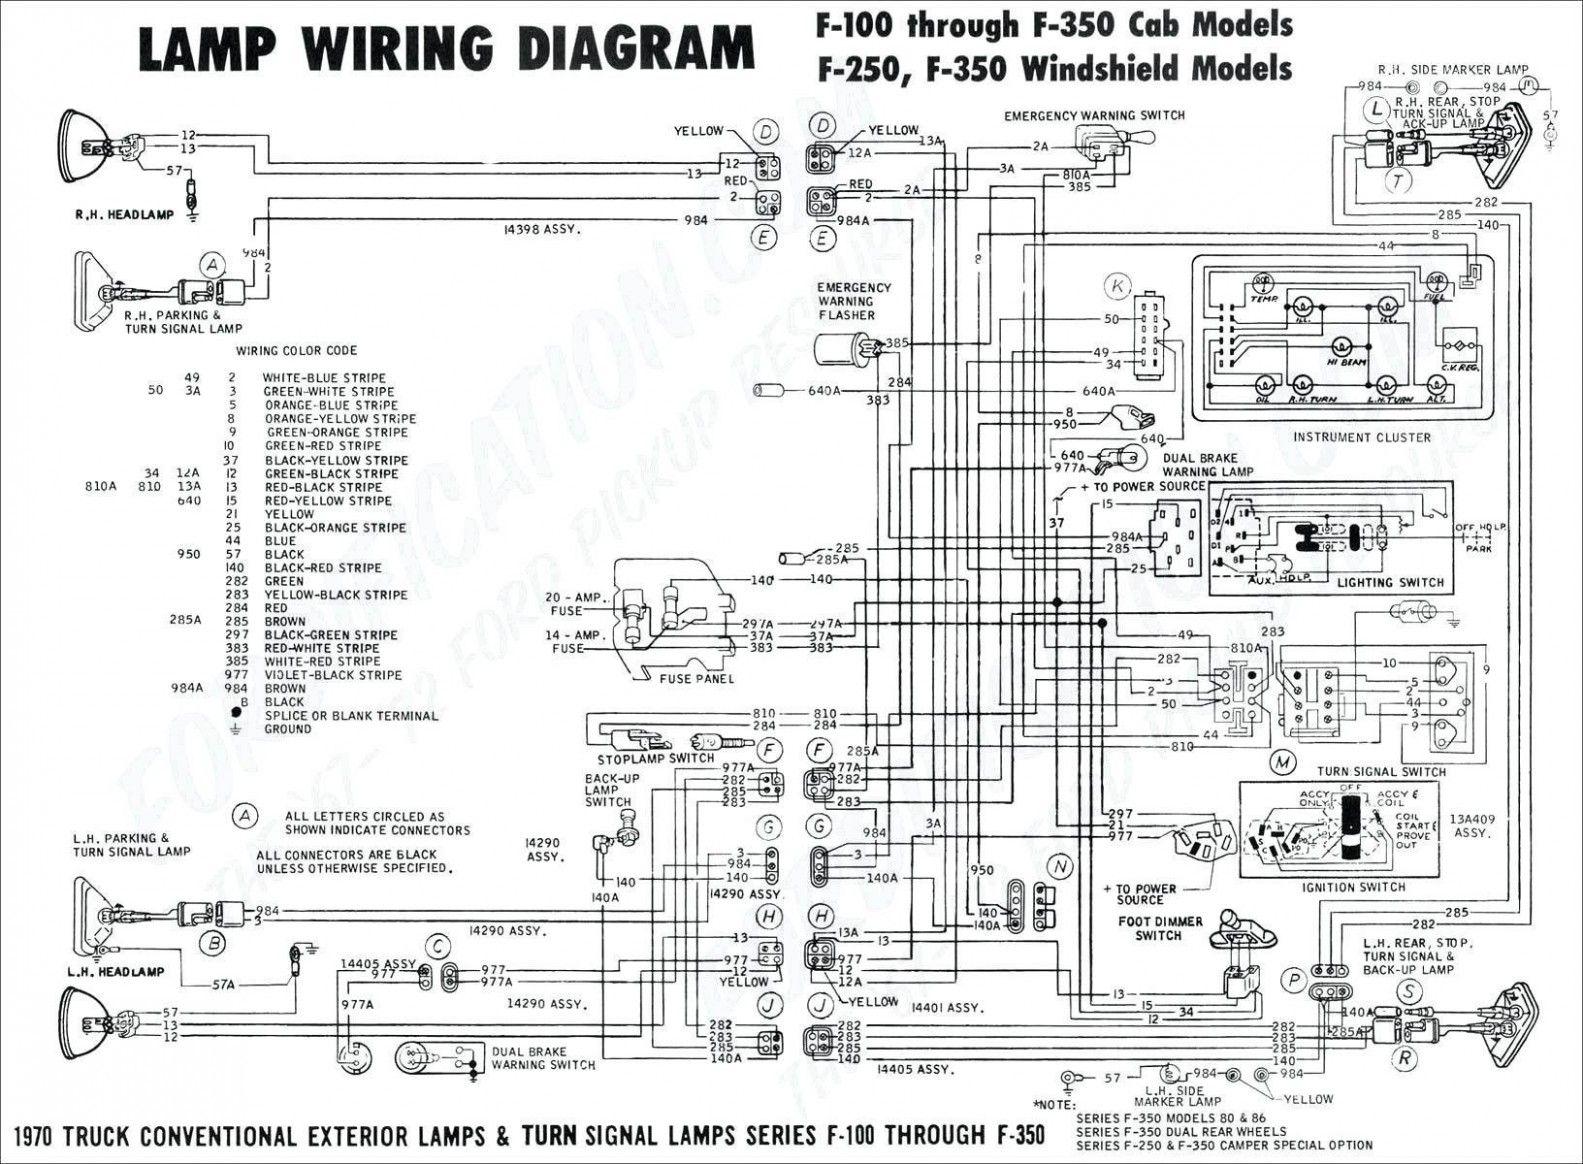 Dt7 Engine Diagram Not Working Honda Accord Nissan Maxima Honda Civic